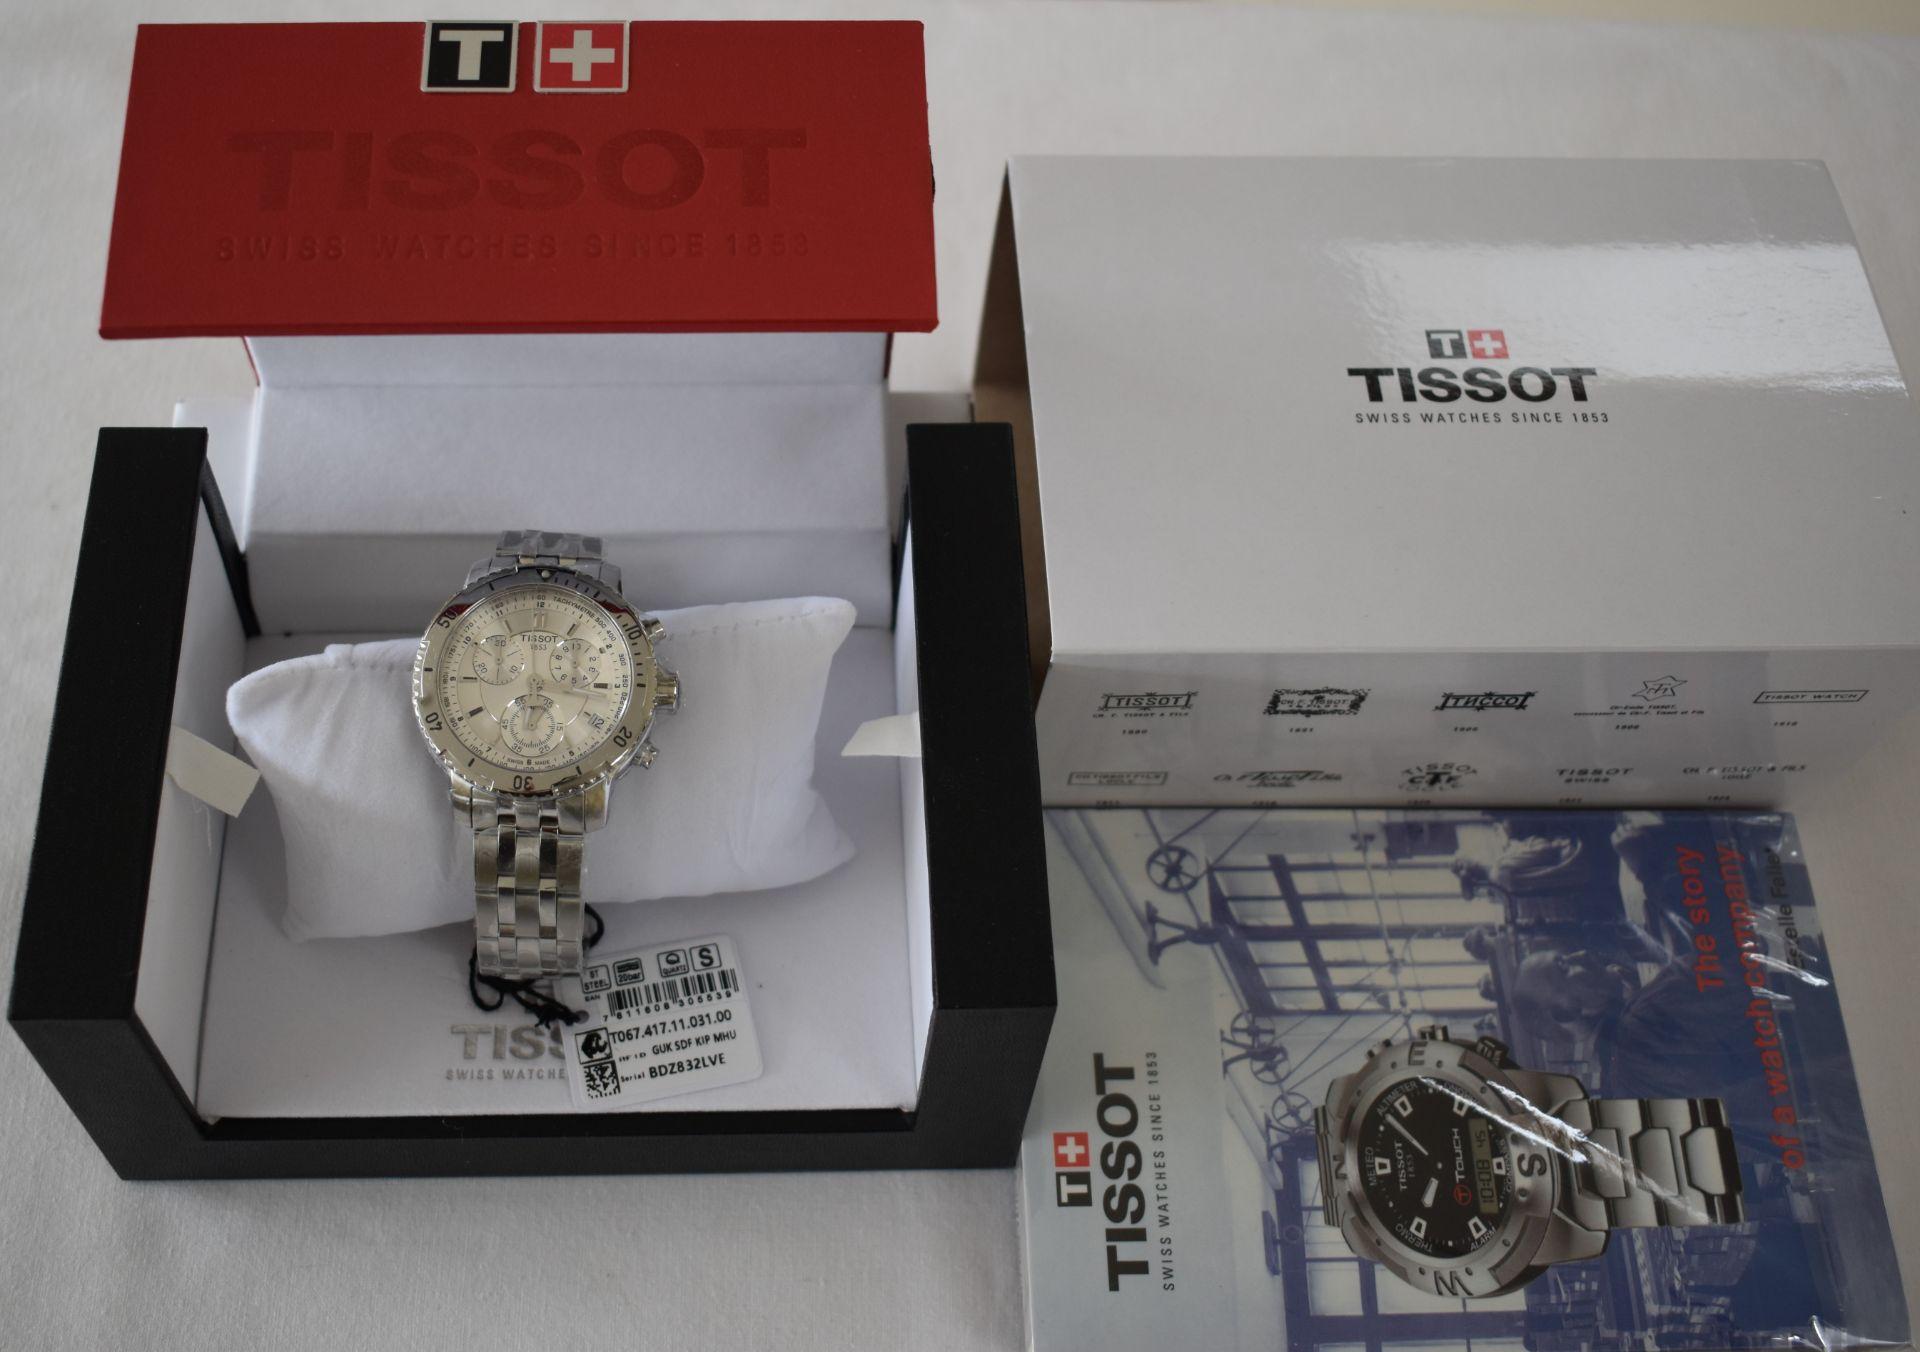 Tissot Men's Watch TO67.417.11.31.00 - Image 3 of 3